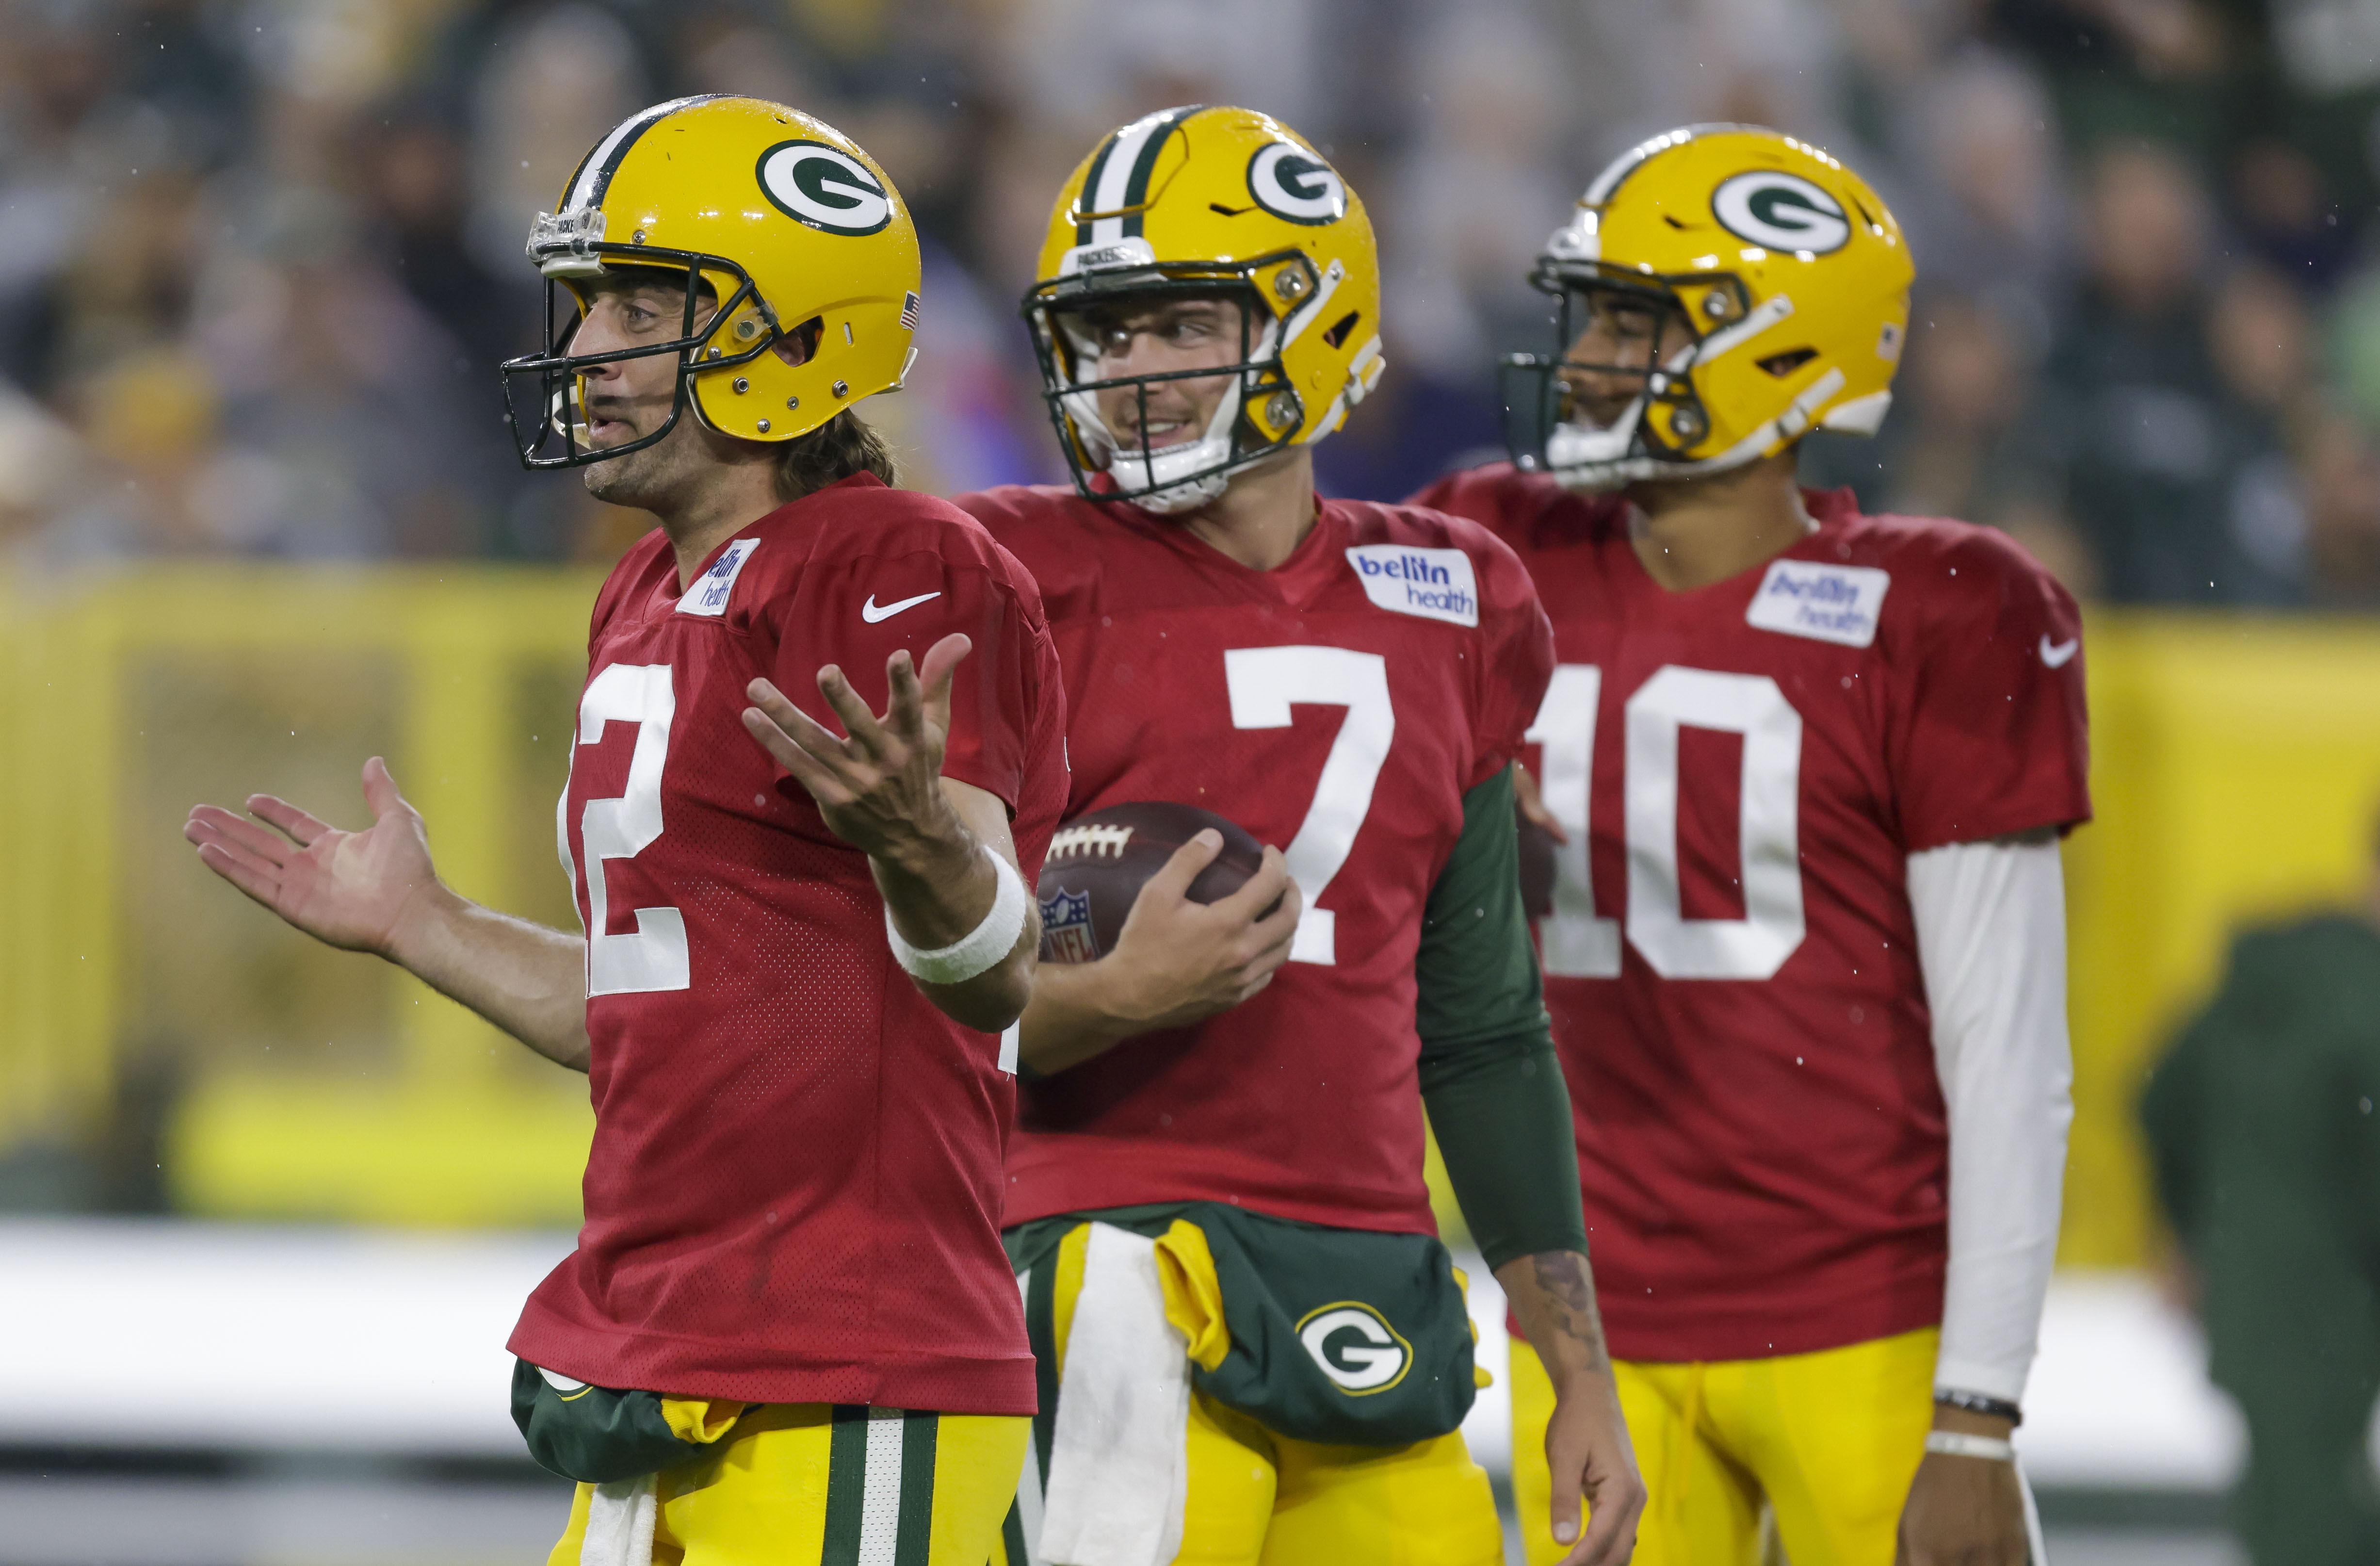 Green Bay Packers quarterback Aaron Rodgers (12) gestures to teammates while quarterbacks Kurt Benkert (7) and Jordan Love (10) look on.